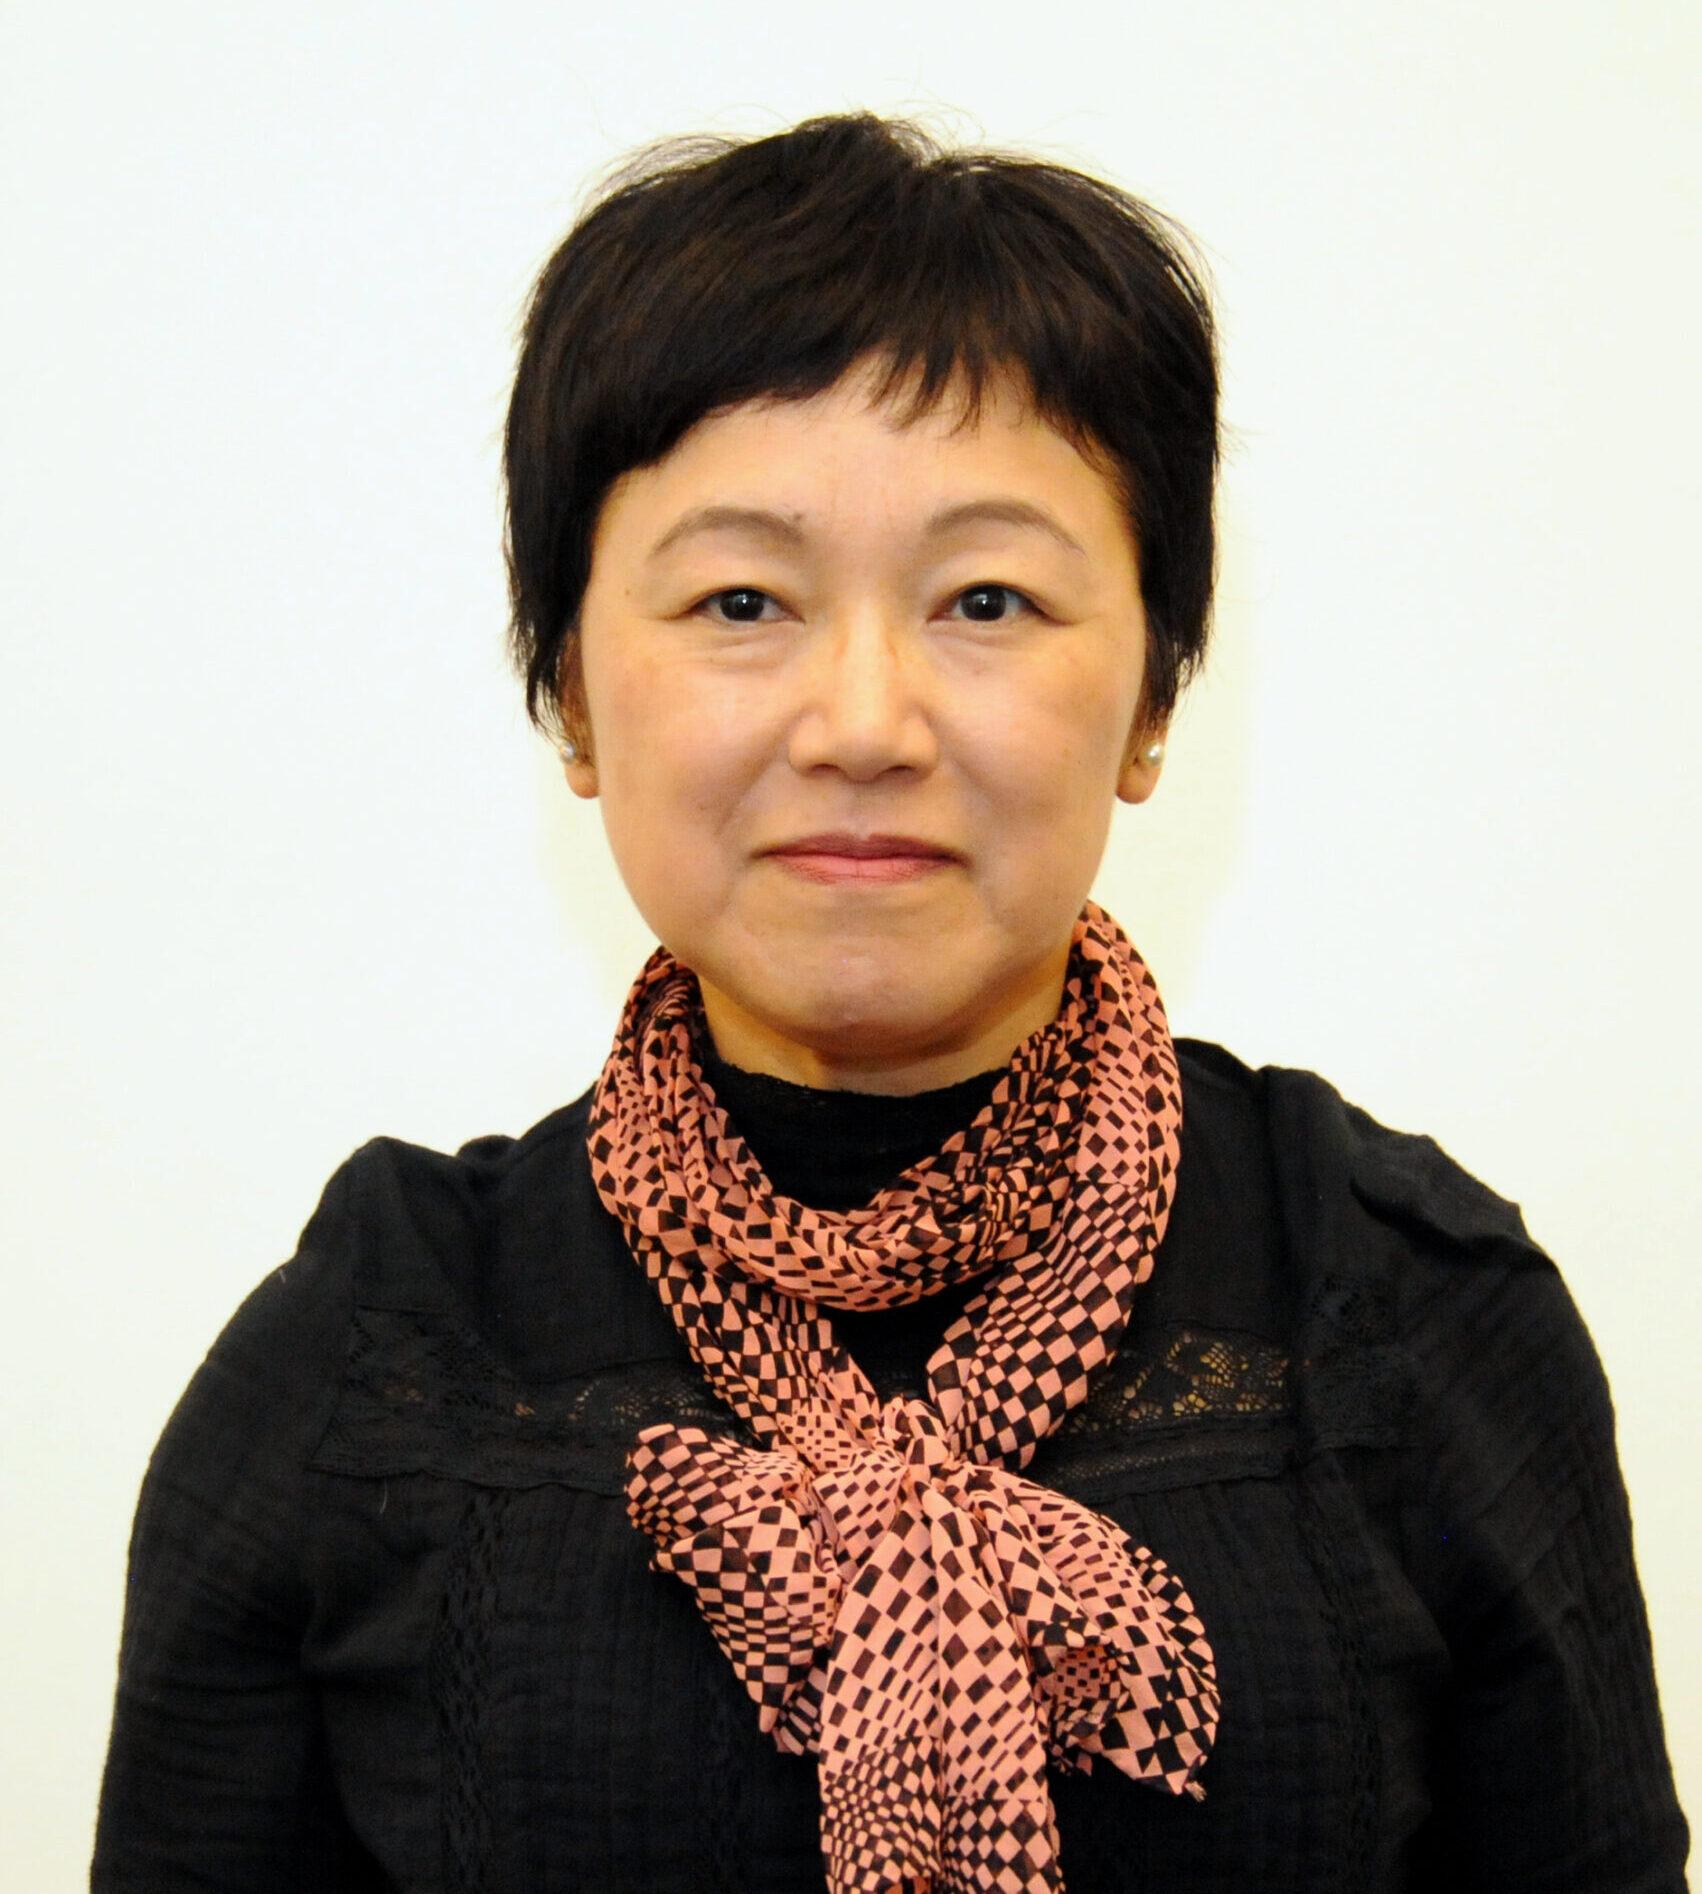 Midori Yamamura : Kingsborough Community College